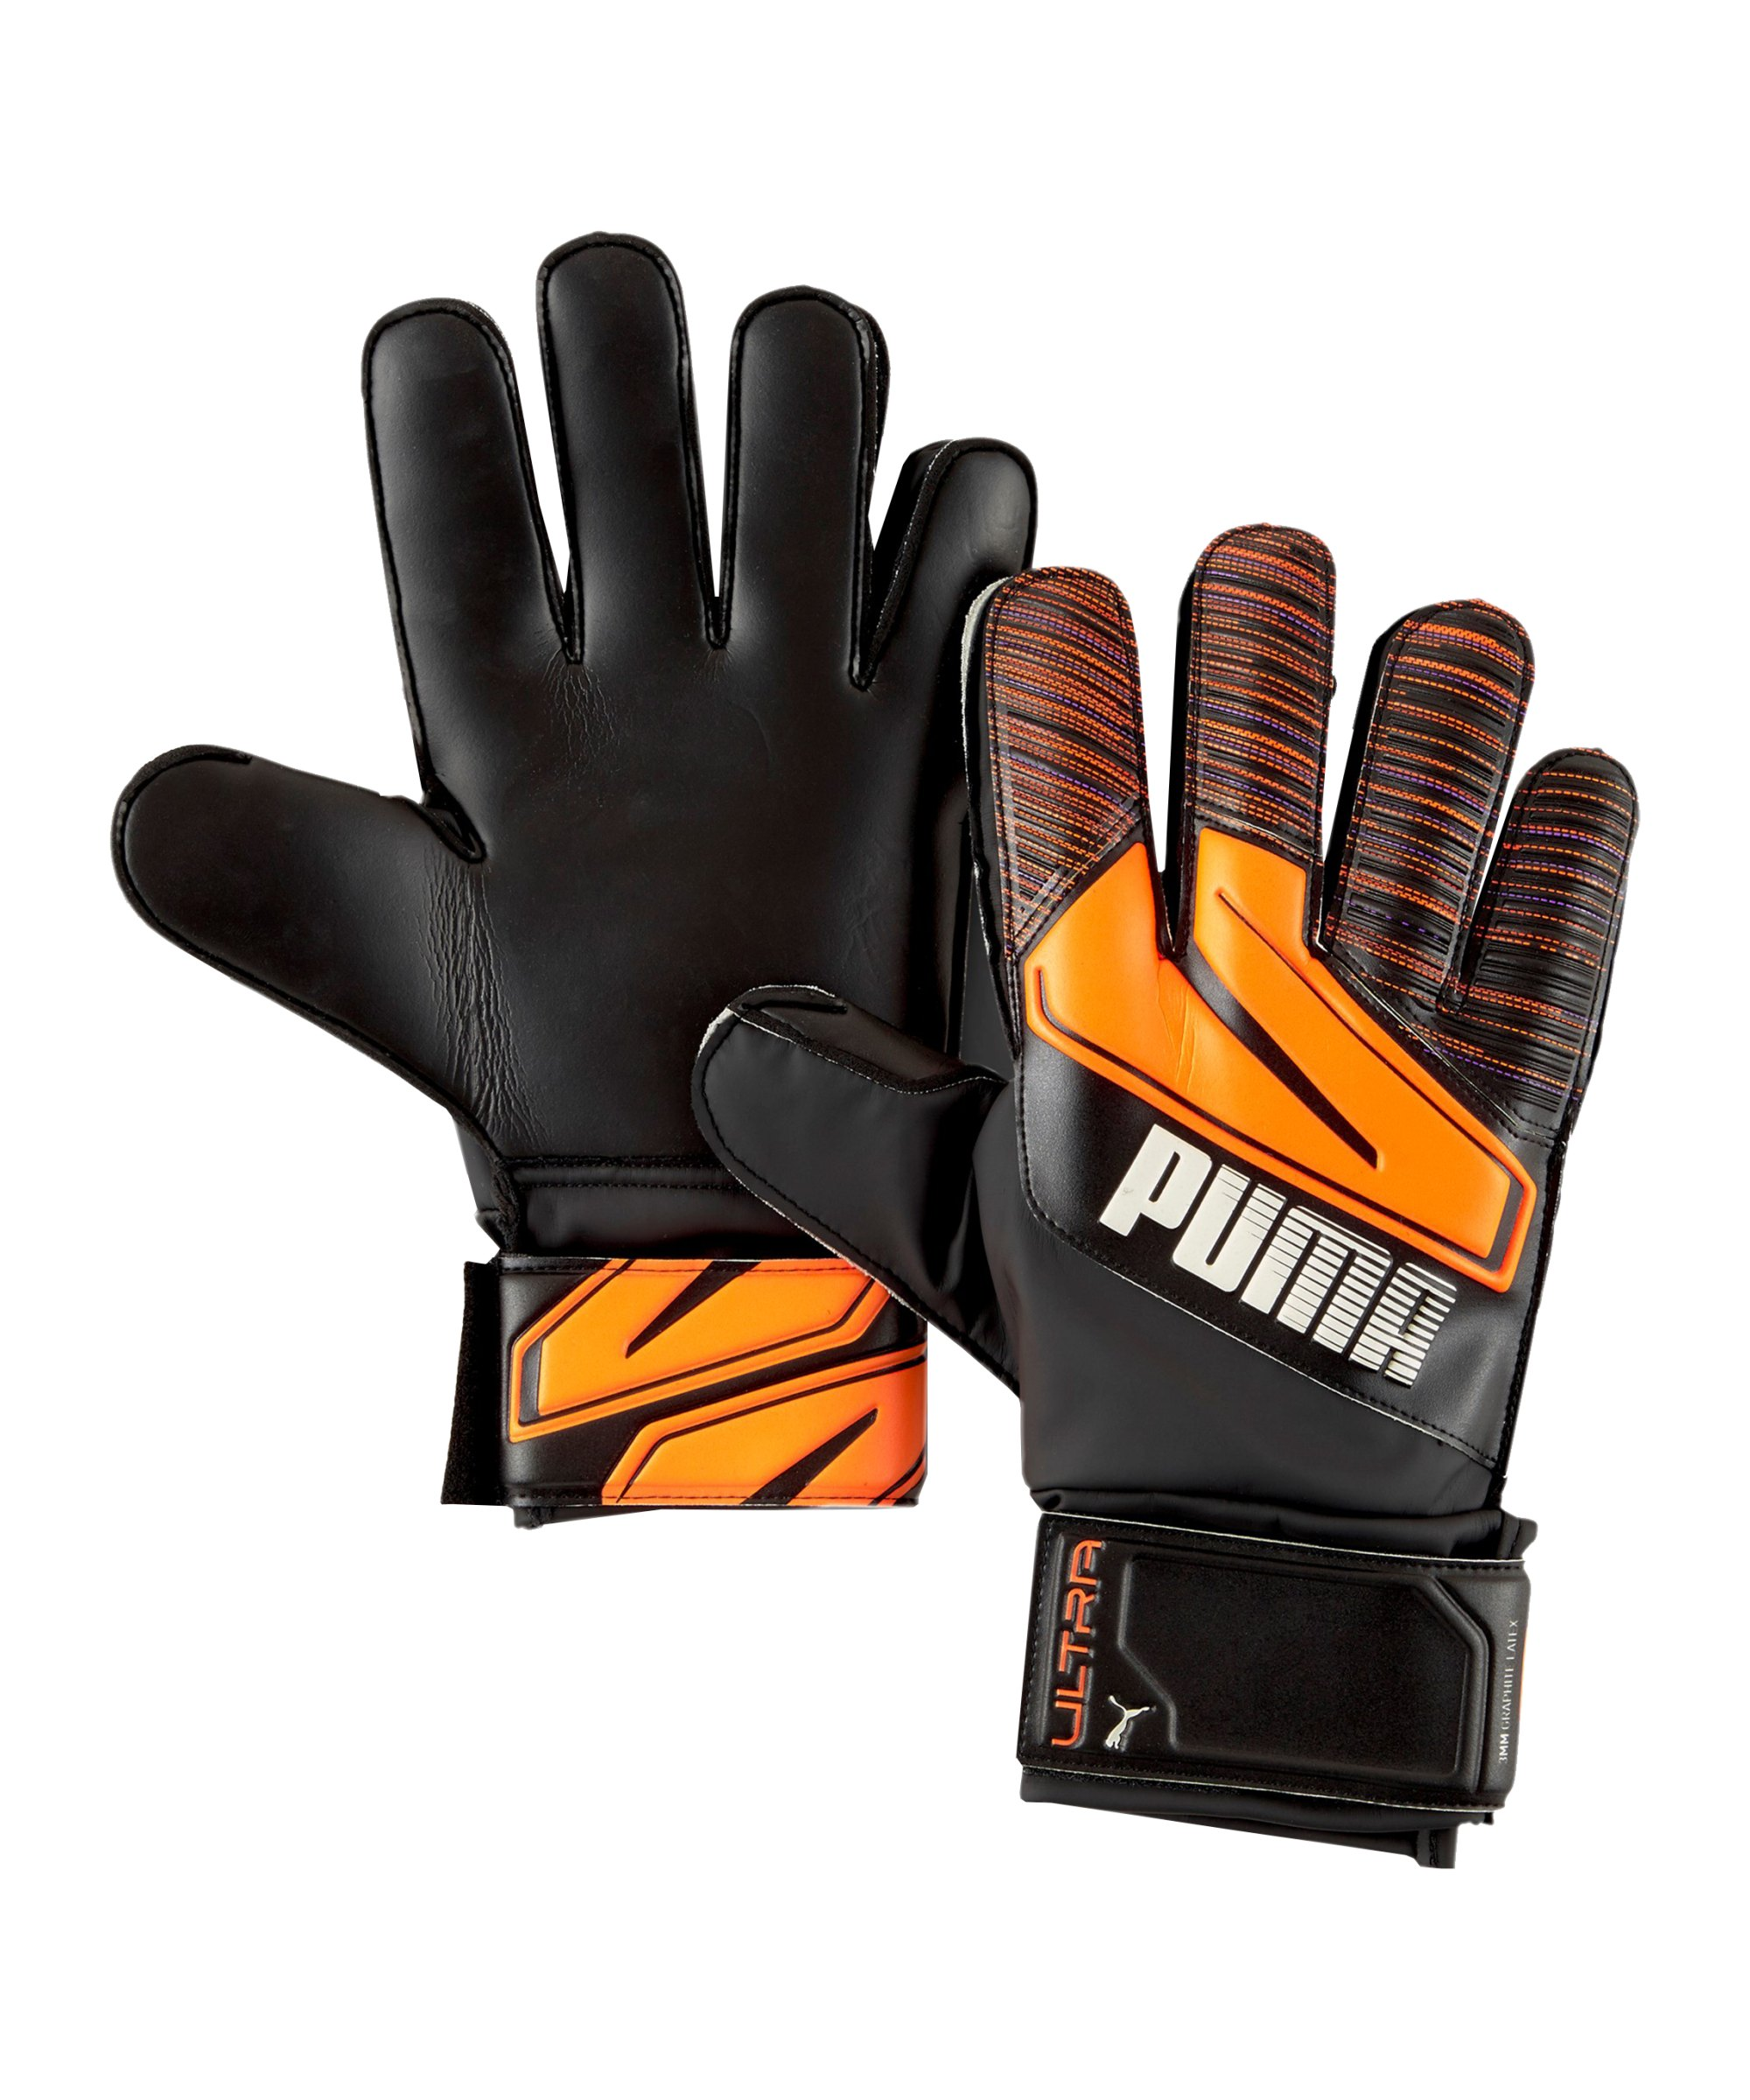 PUMA ULTRA Protect 3 RC Torwarthandschuh F01 - orange